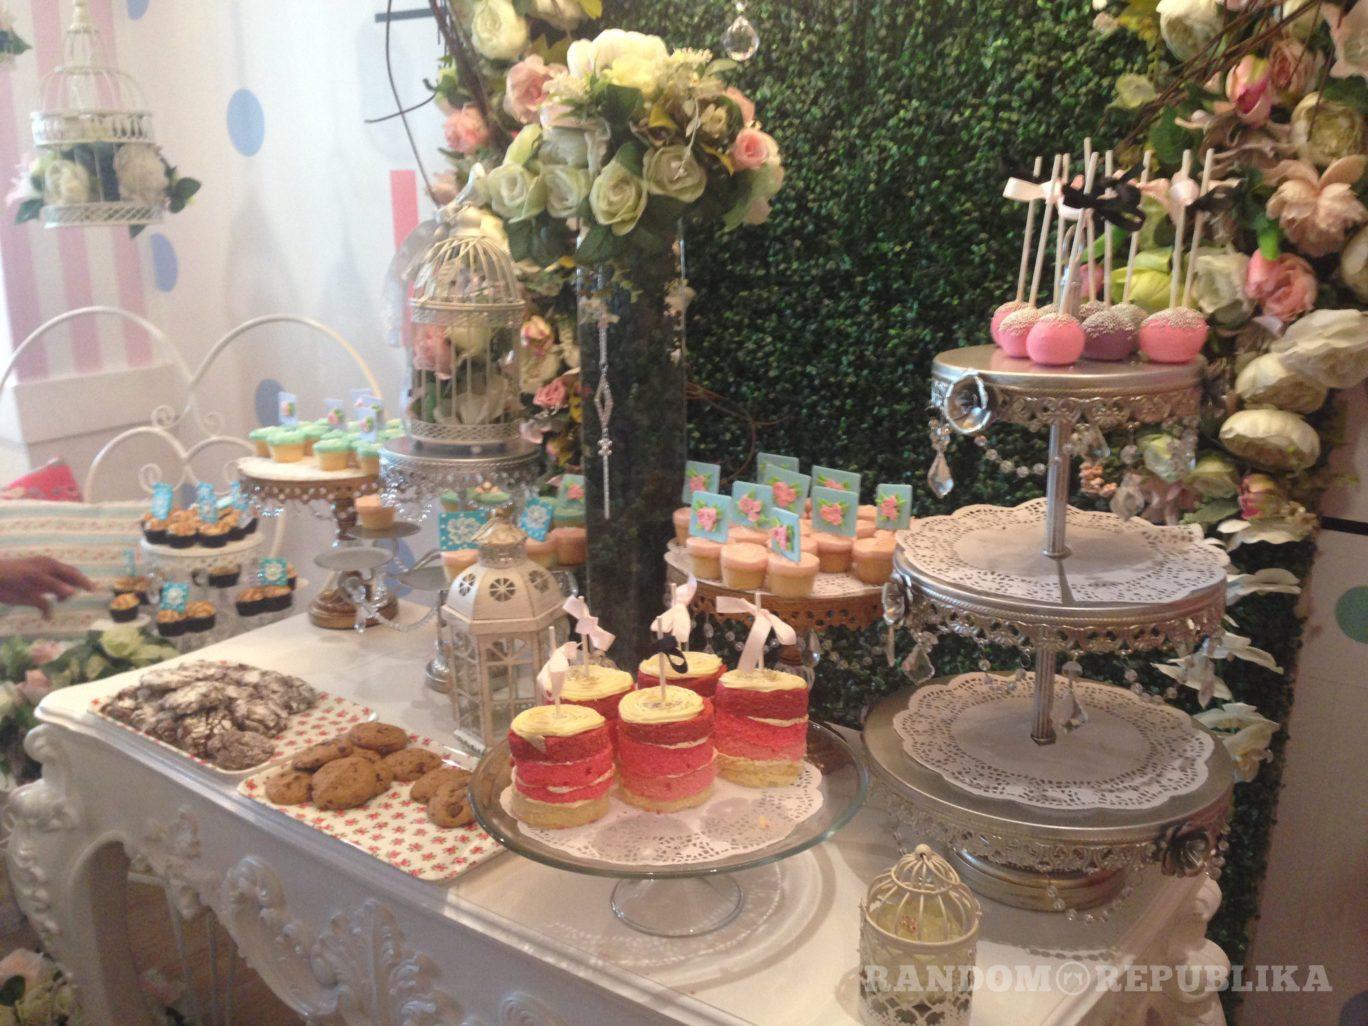 Kim Chiu Chinita Princess Mr. Right Vanilla Cupcake Bakery Xian Lim gerald anderson Maja Salvador Kimxi Album Press Conference 4